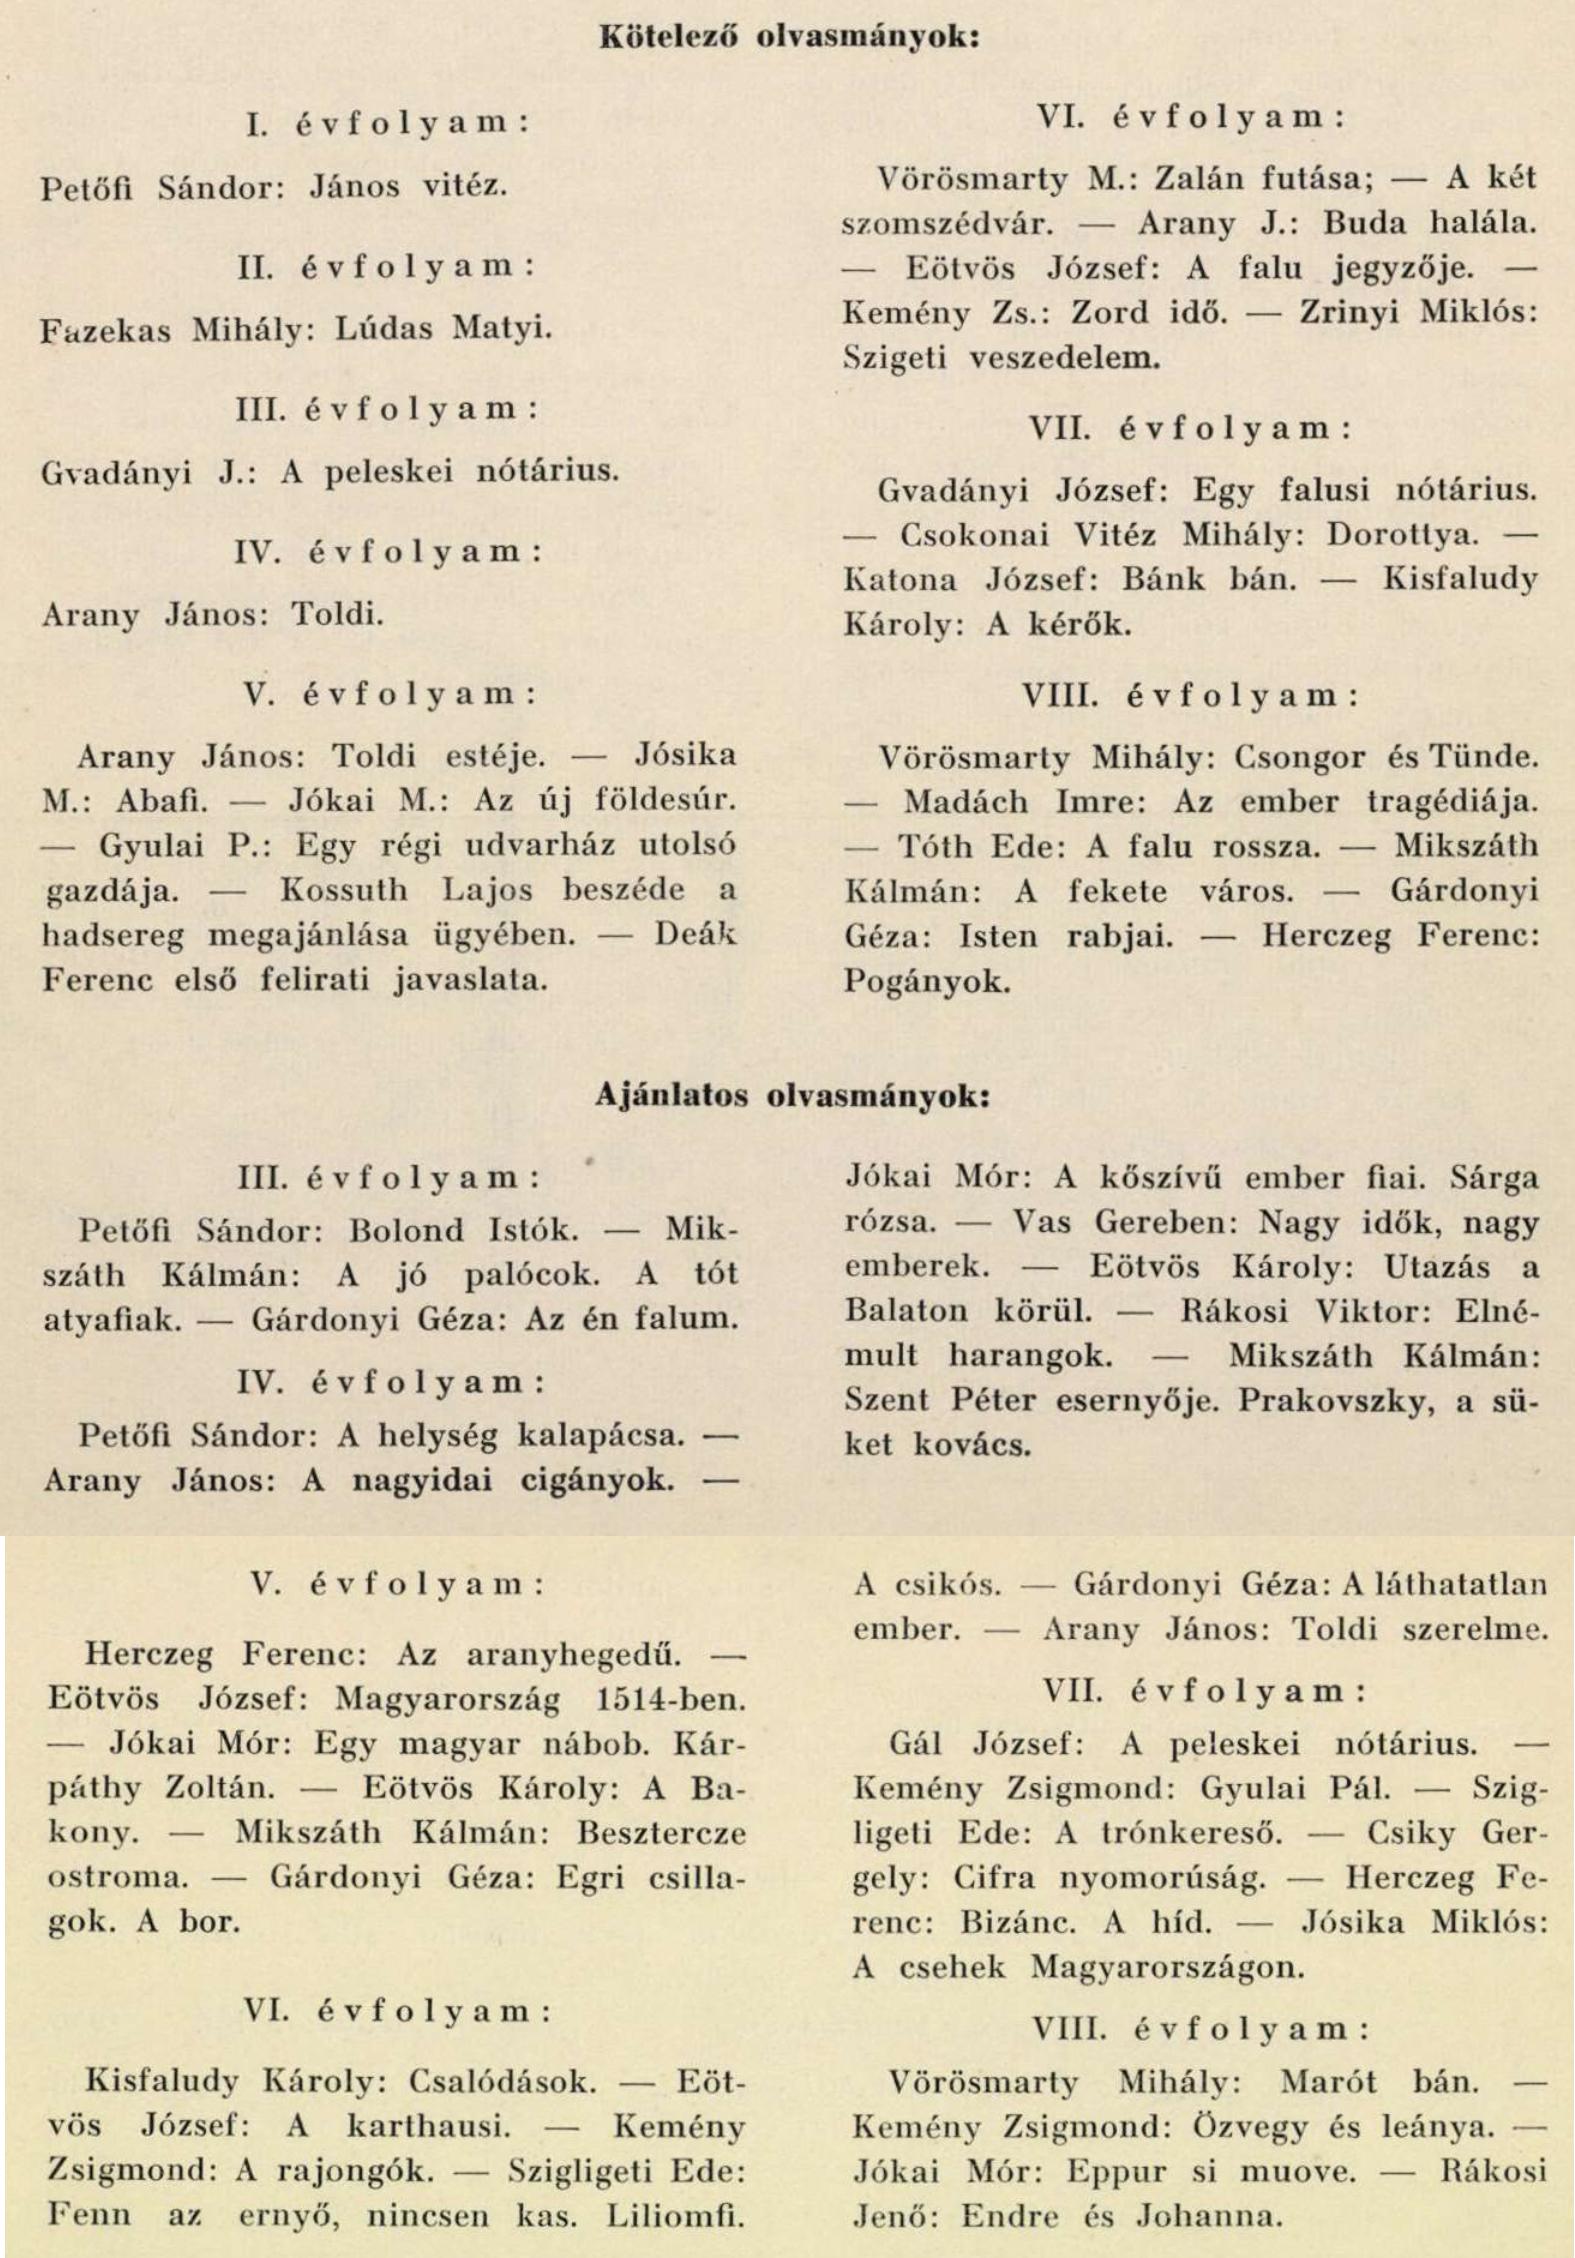 1936-kotelezok.jpg